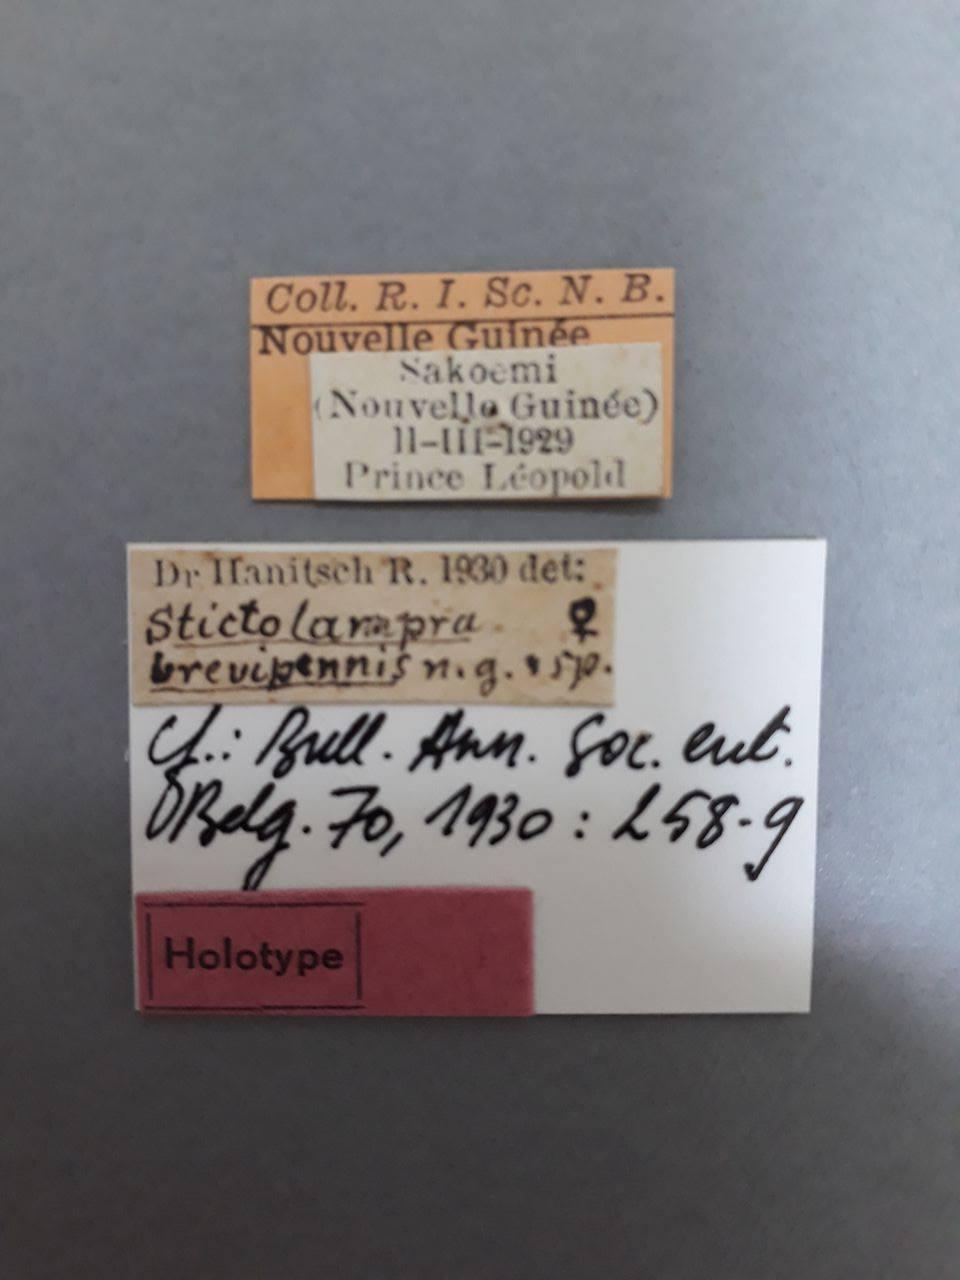 Stictolampra brevipennis ht.jpg